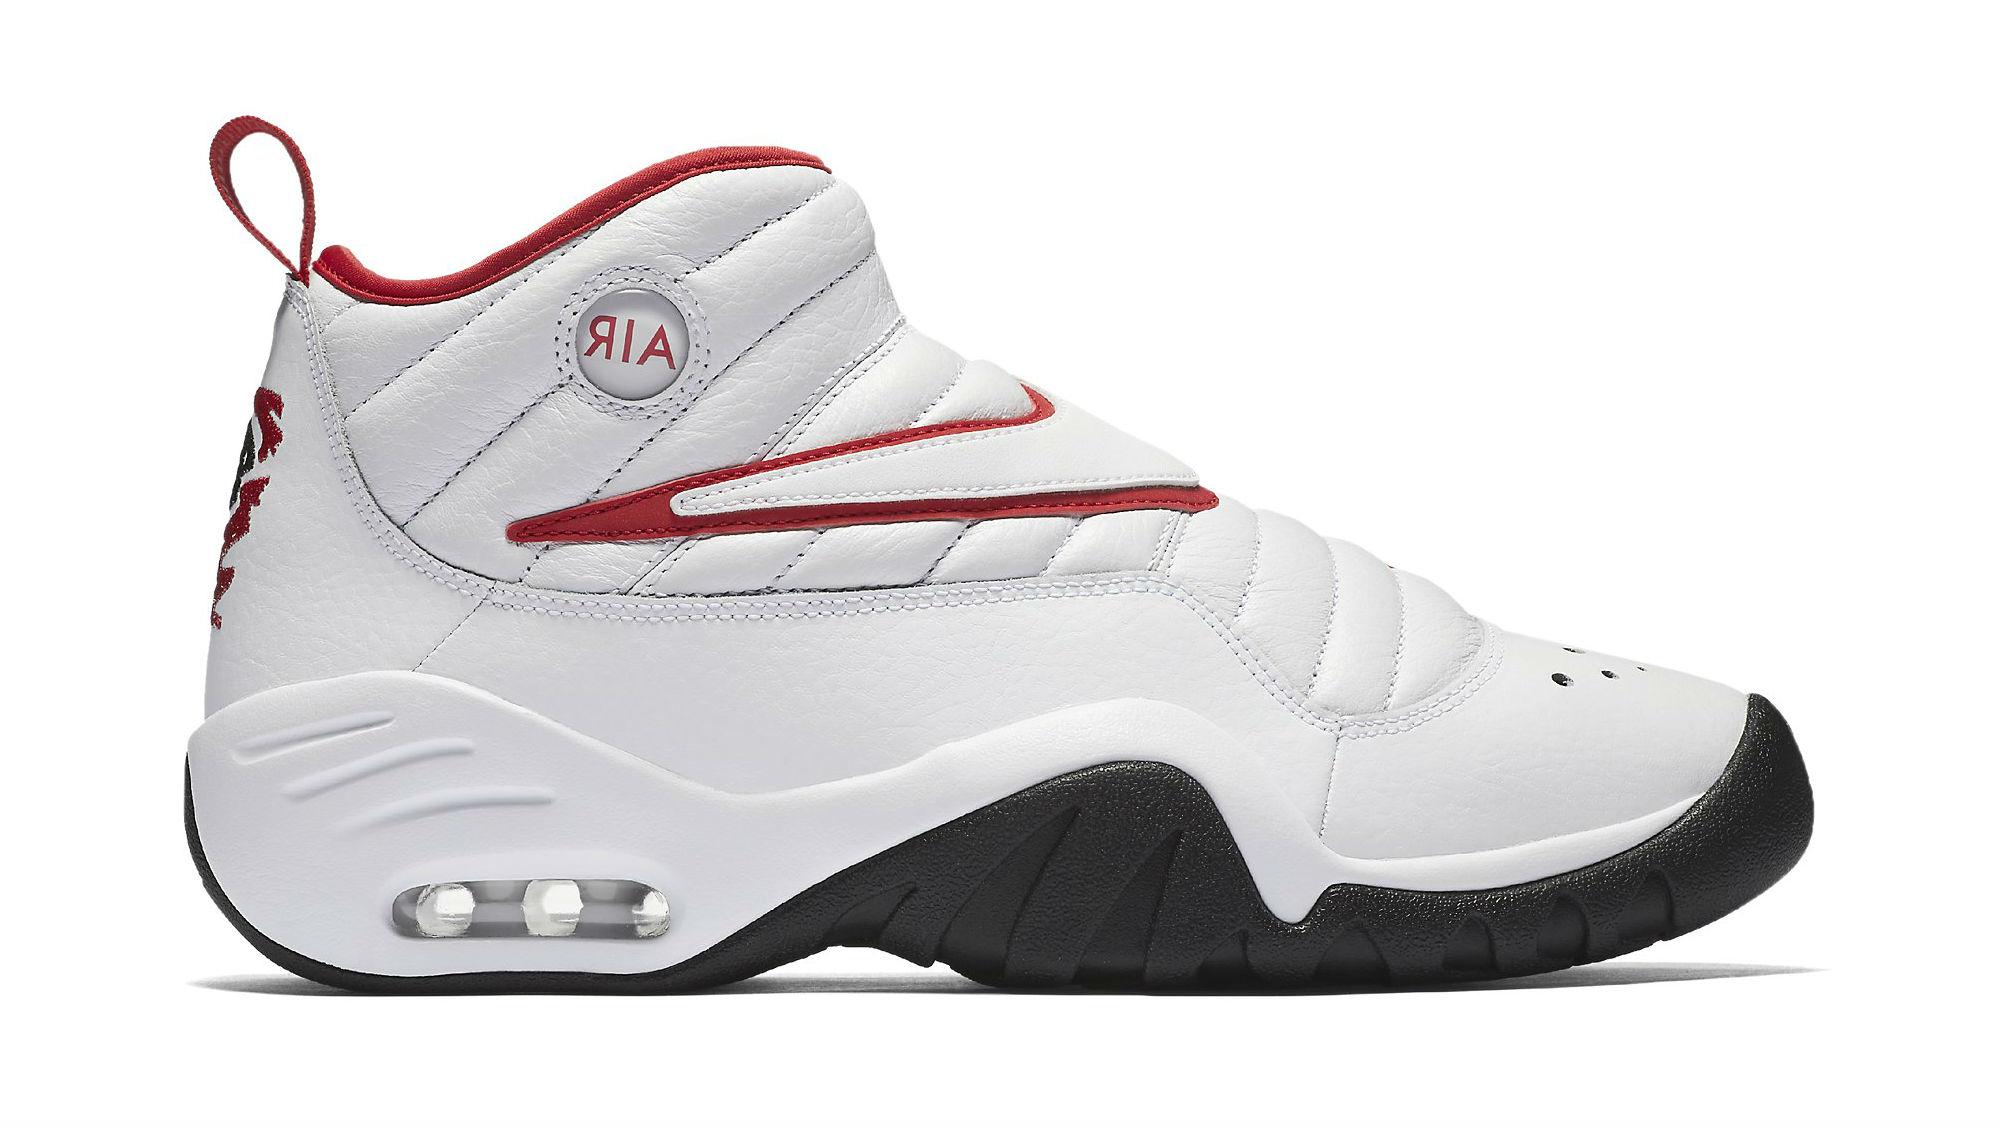 Nike Air Shake Ndestrukt White/White-Black